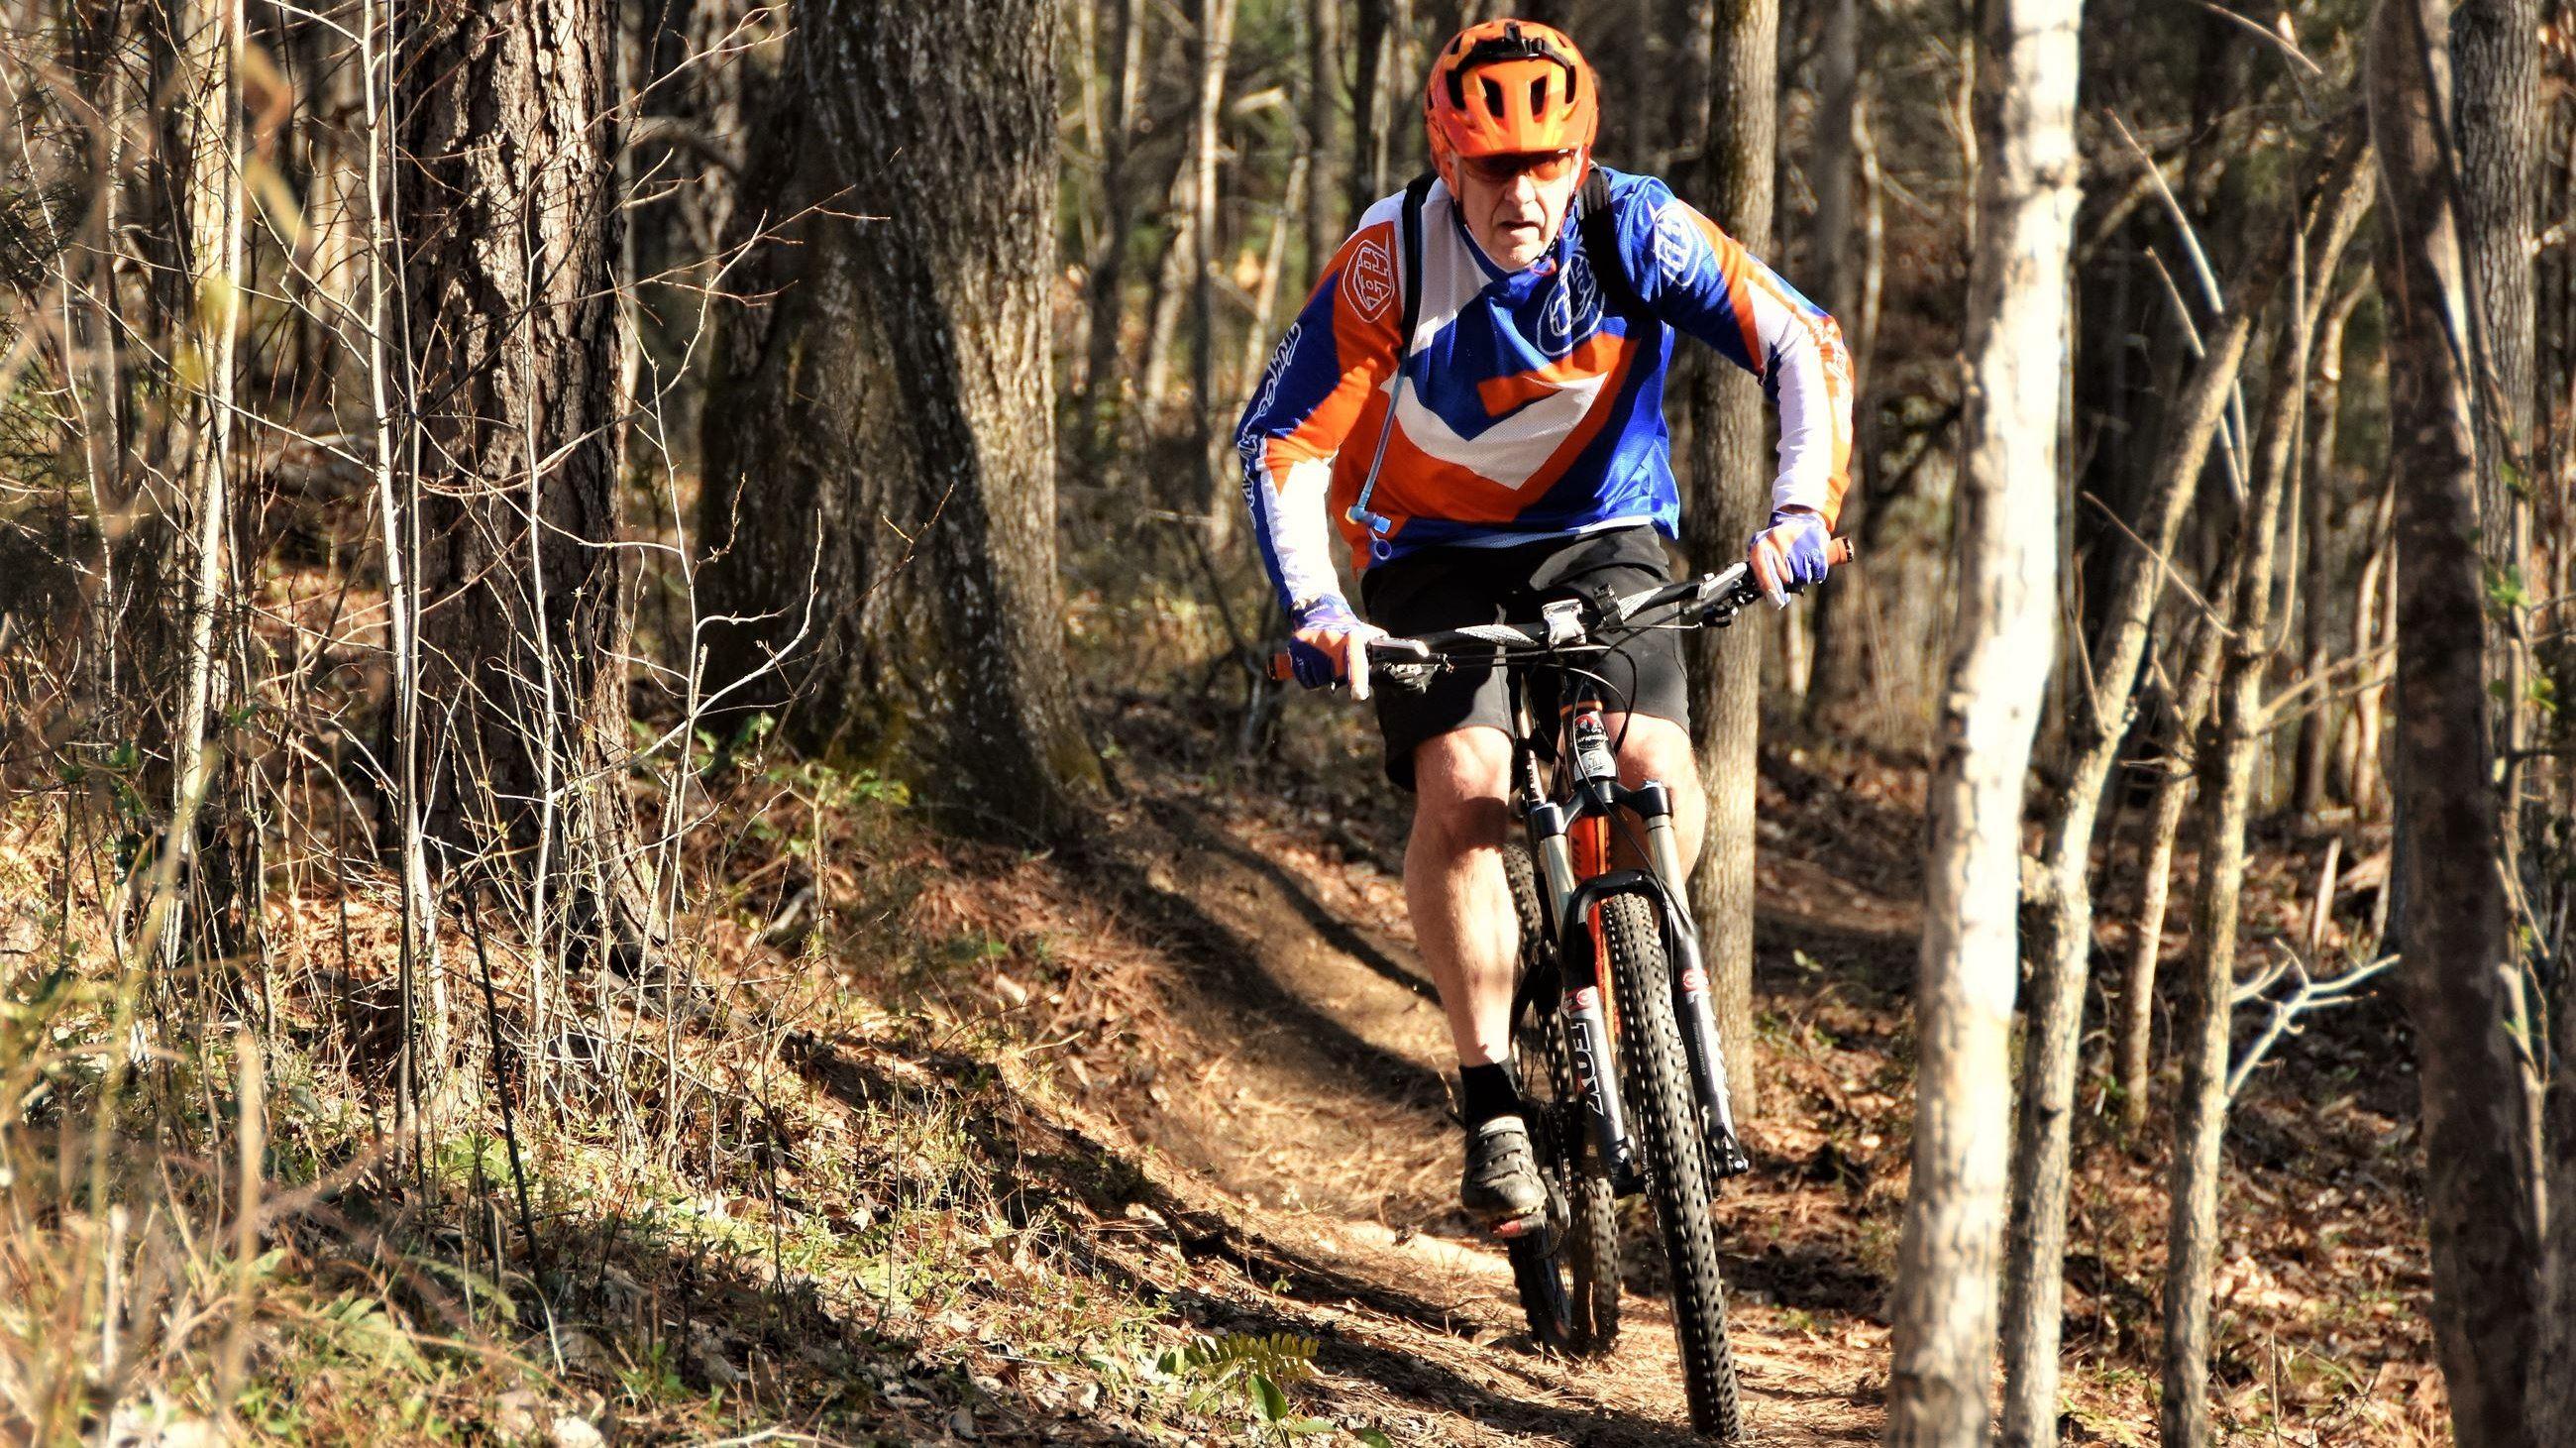 Parks & Recreation | Goochland County, VA - Official Website